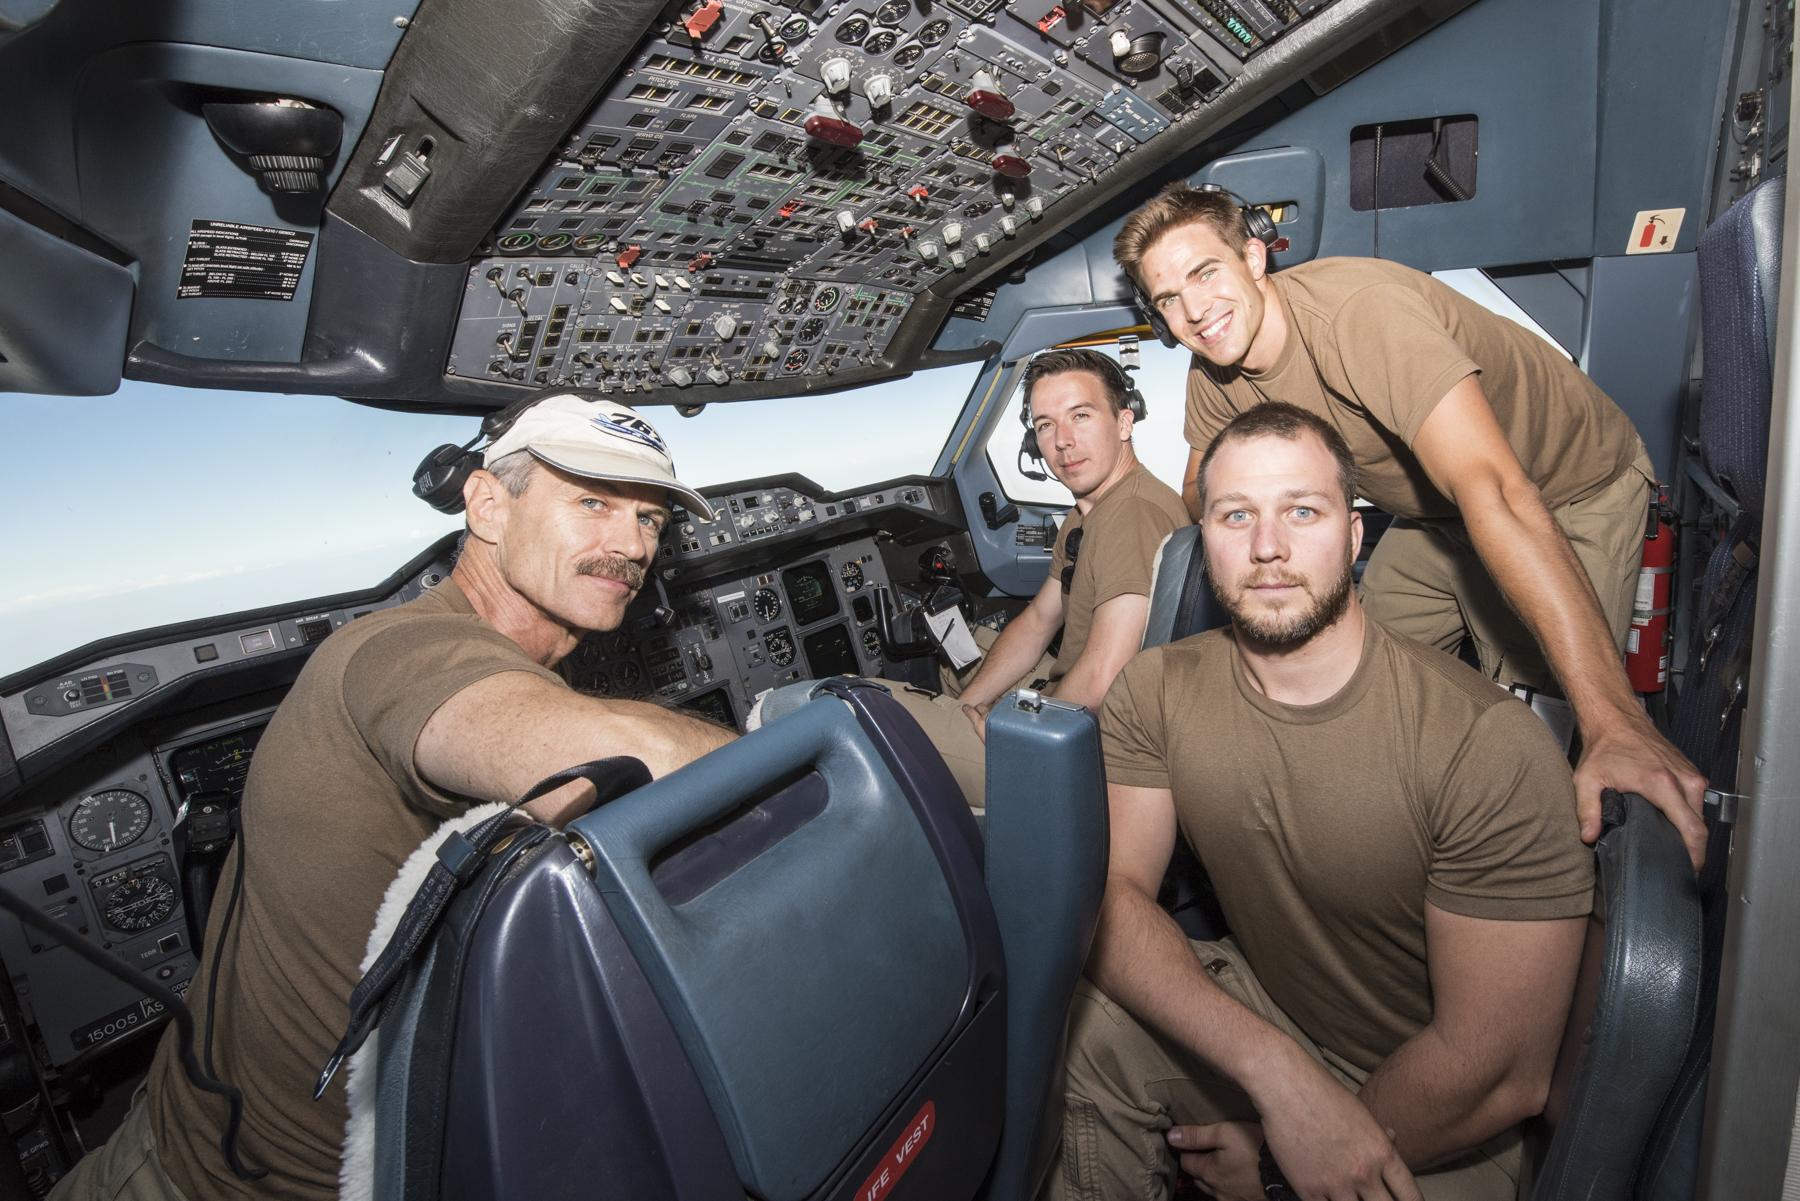 JD's Crew Op IMpact Aug 15.jpg